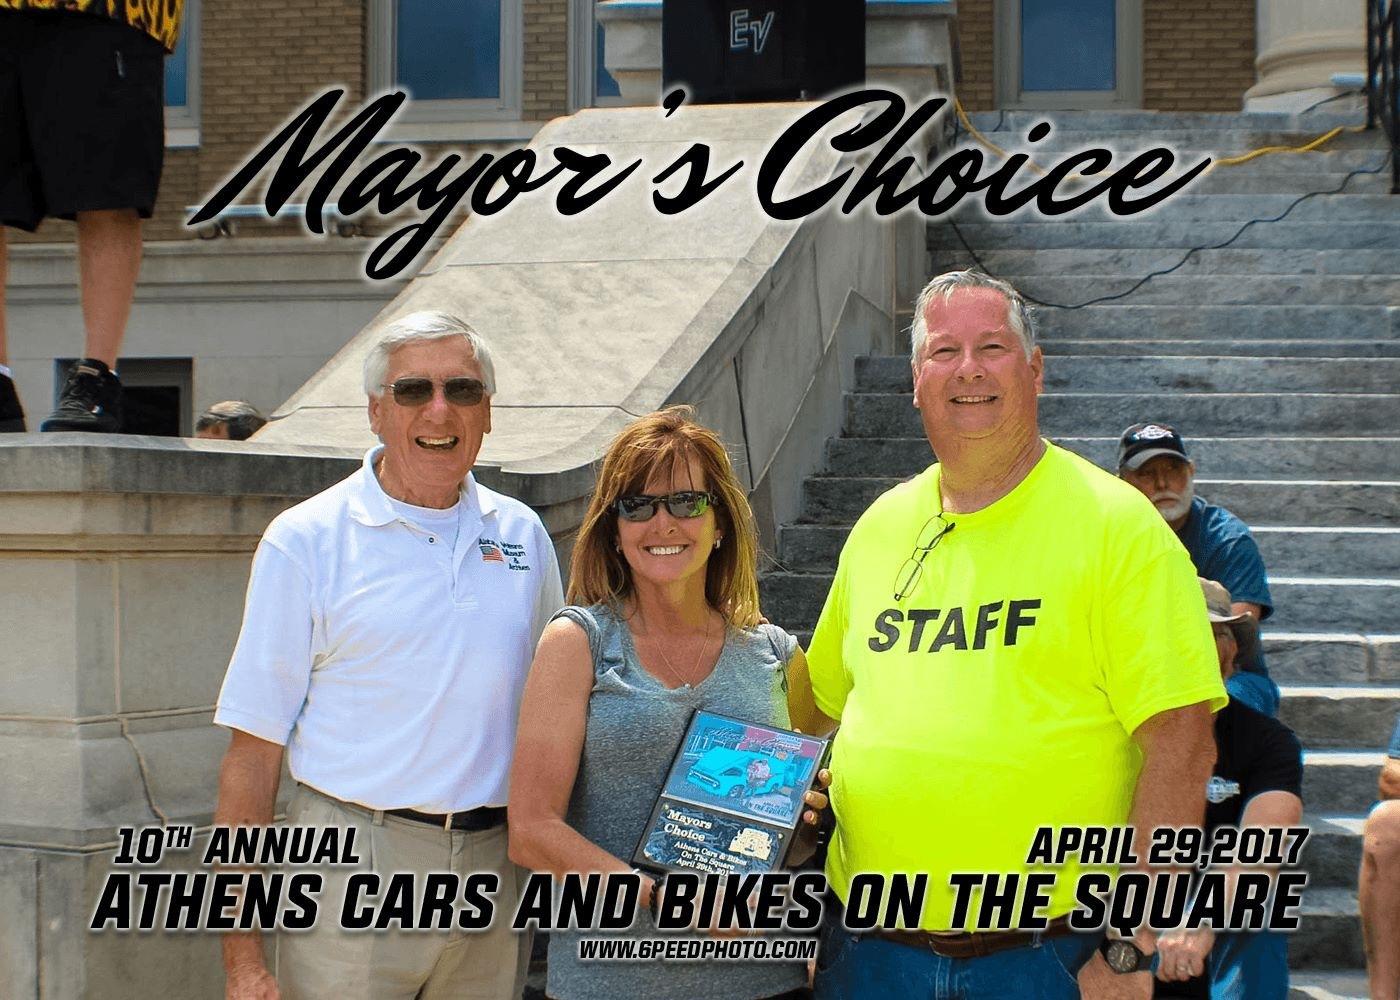 Mayor's Choice